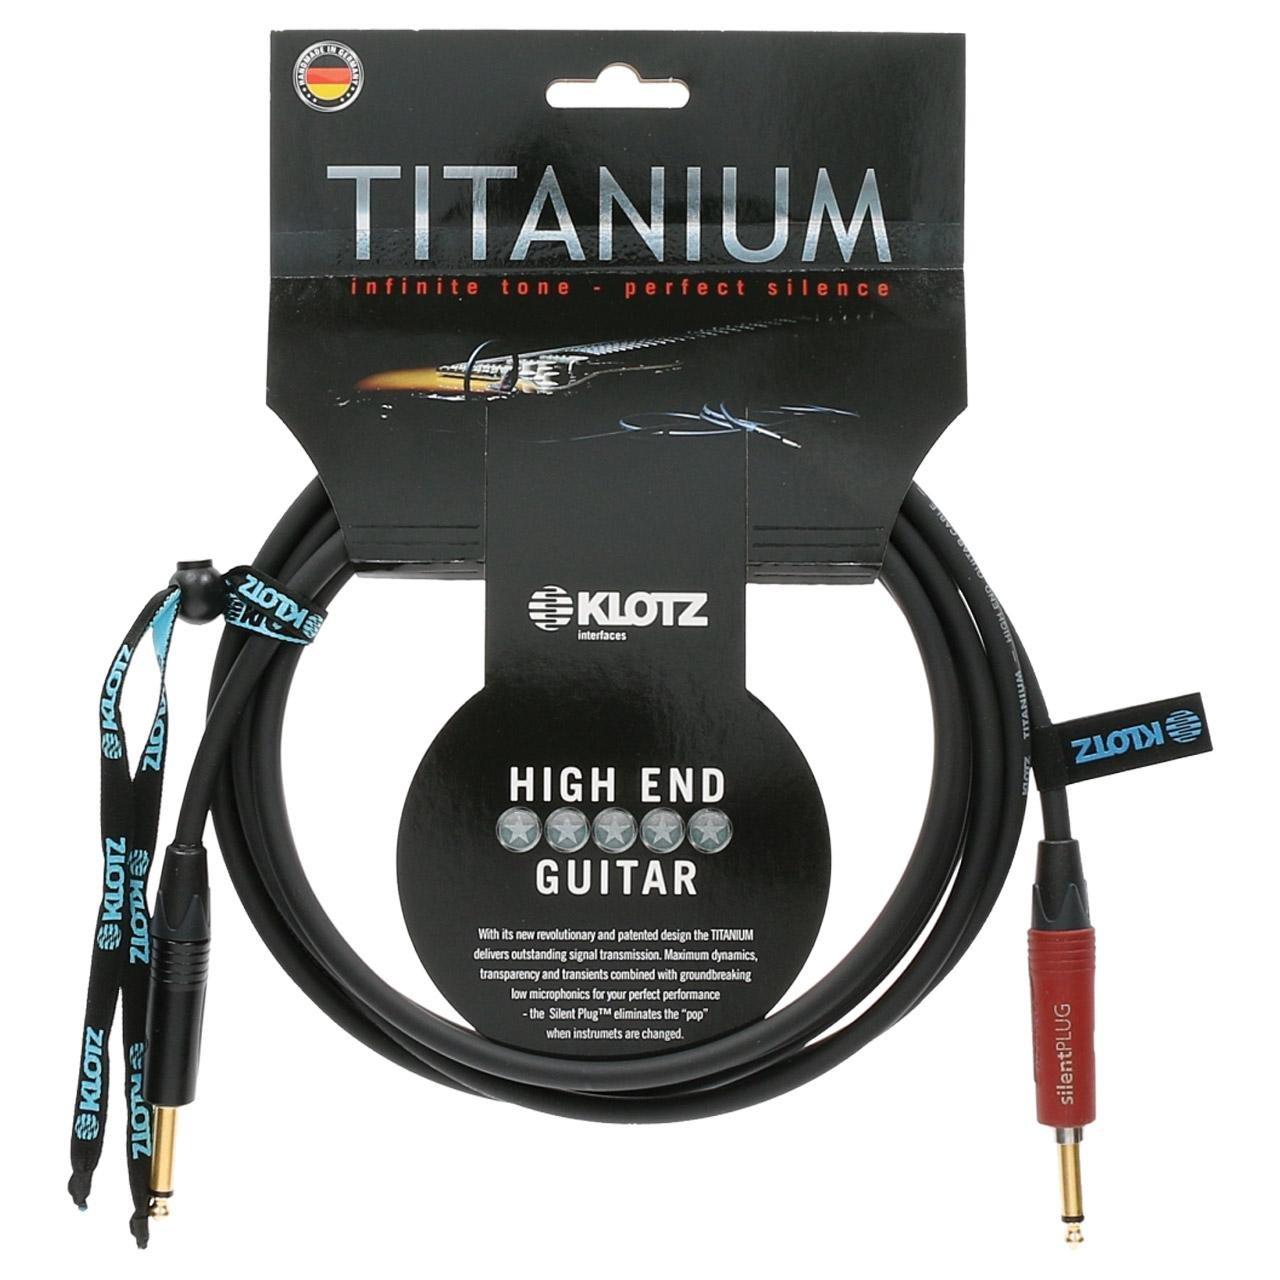 KLOTZ Titanium 20 Foot Instrument Cable (KLO-TI-0600PSP)